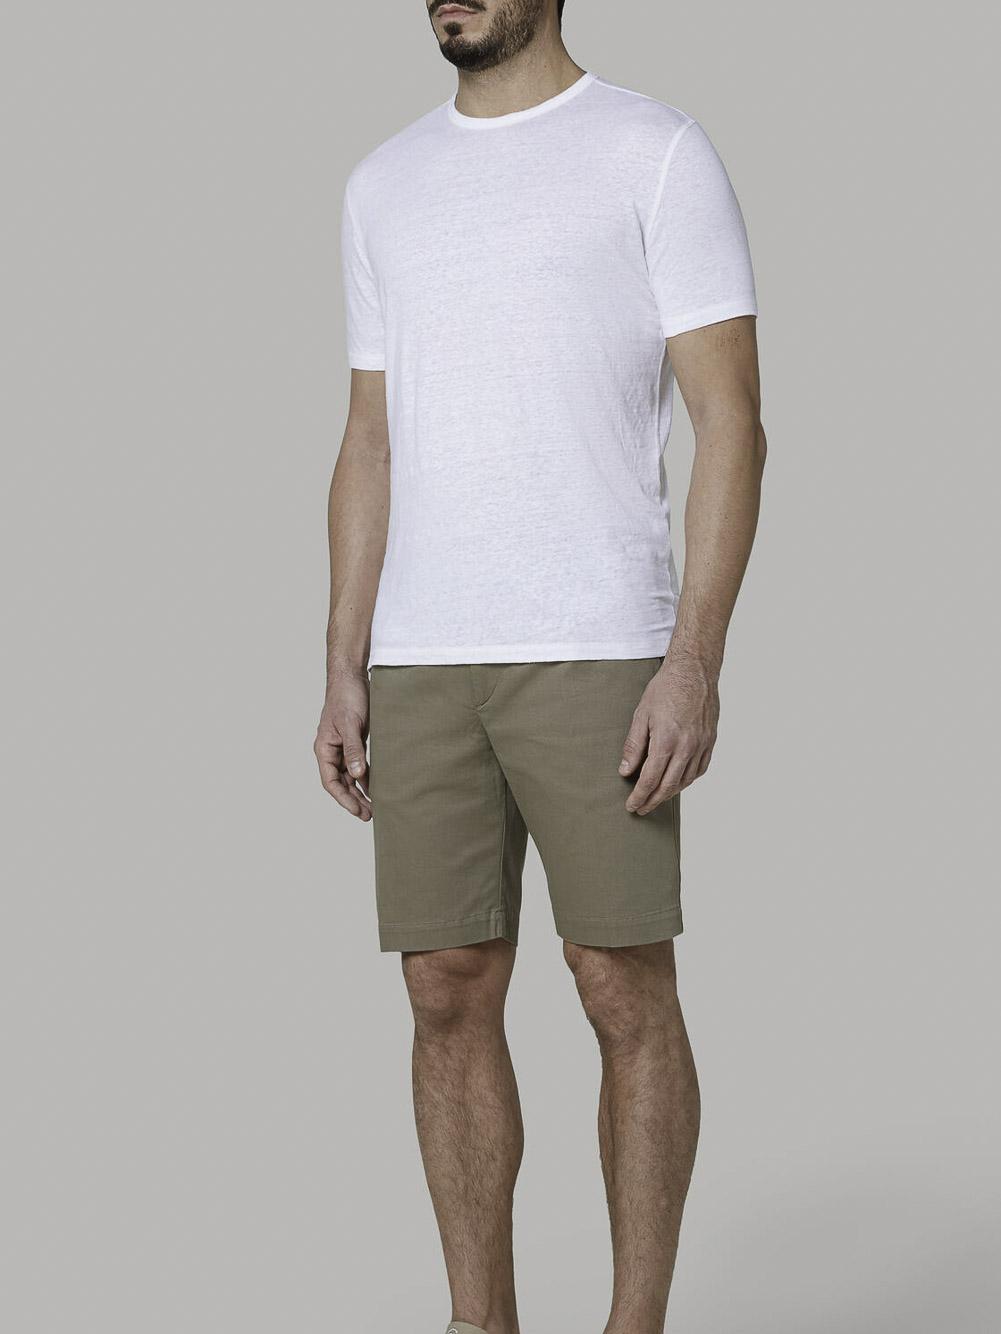 BOGGI Μπλούζα Τ-shirt B021P059401 ΛΕΥΚΟ